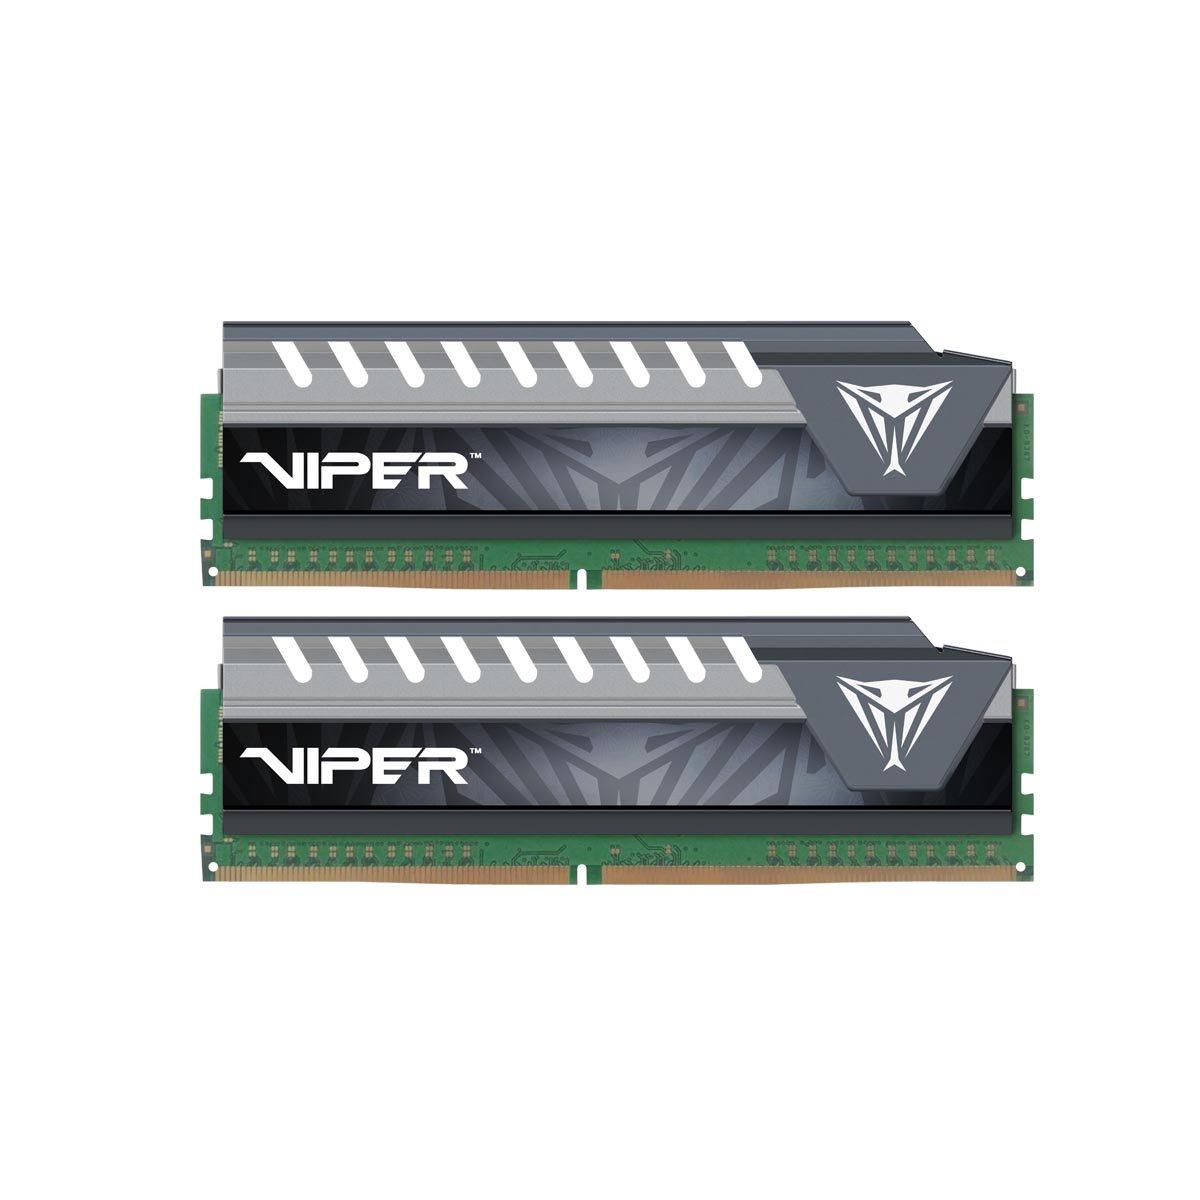 Patriot Memory Performance Viper Elite DDR4 8GB Memory Kit PC4-17000 (2133MHZ) PVE48G213C4KGY Gray by Patriot